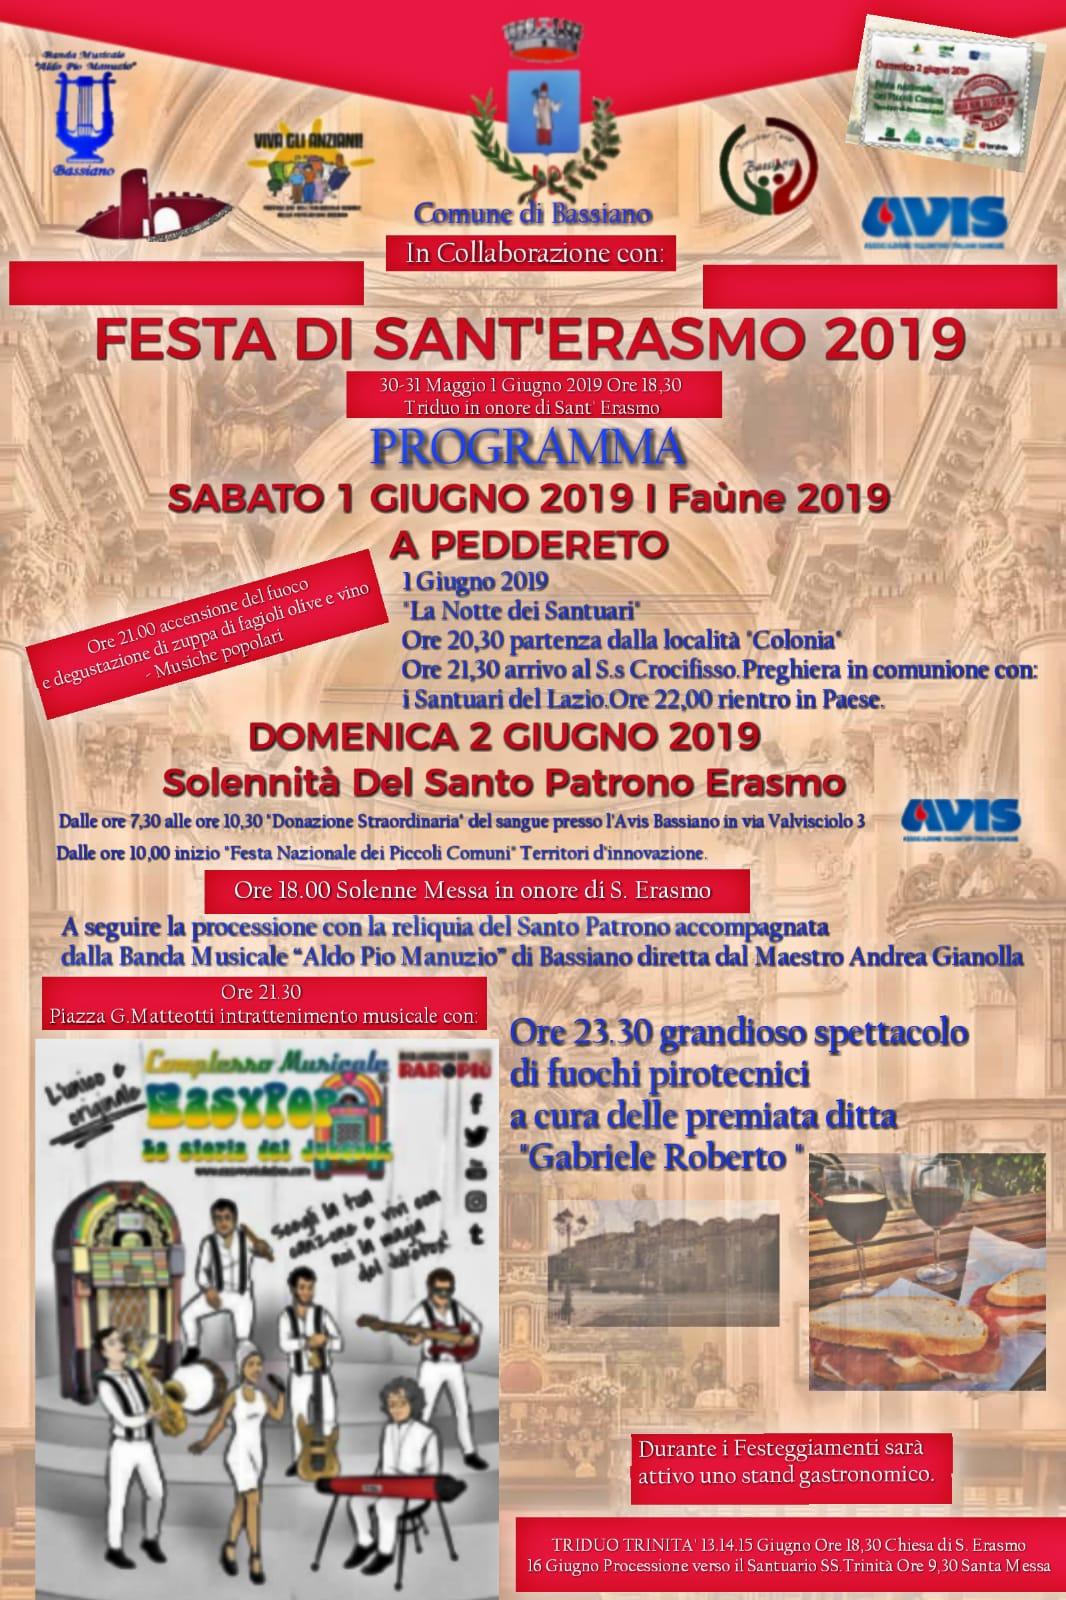 FESTA DI SANT'ERASMO 2019